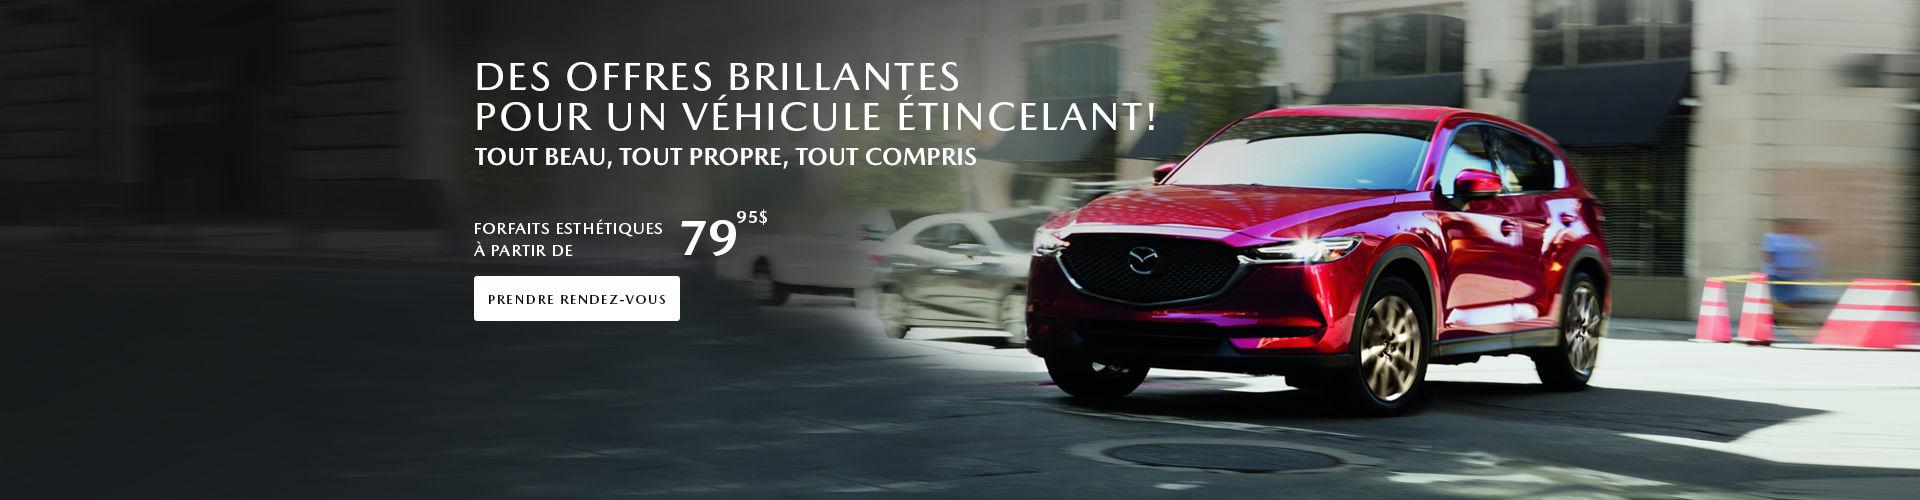 Offres esthétiques Mazda